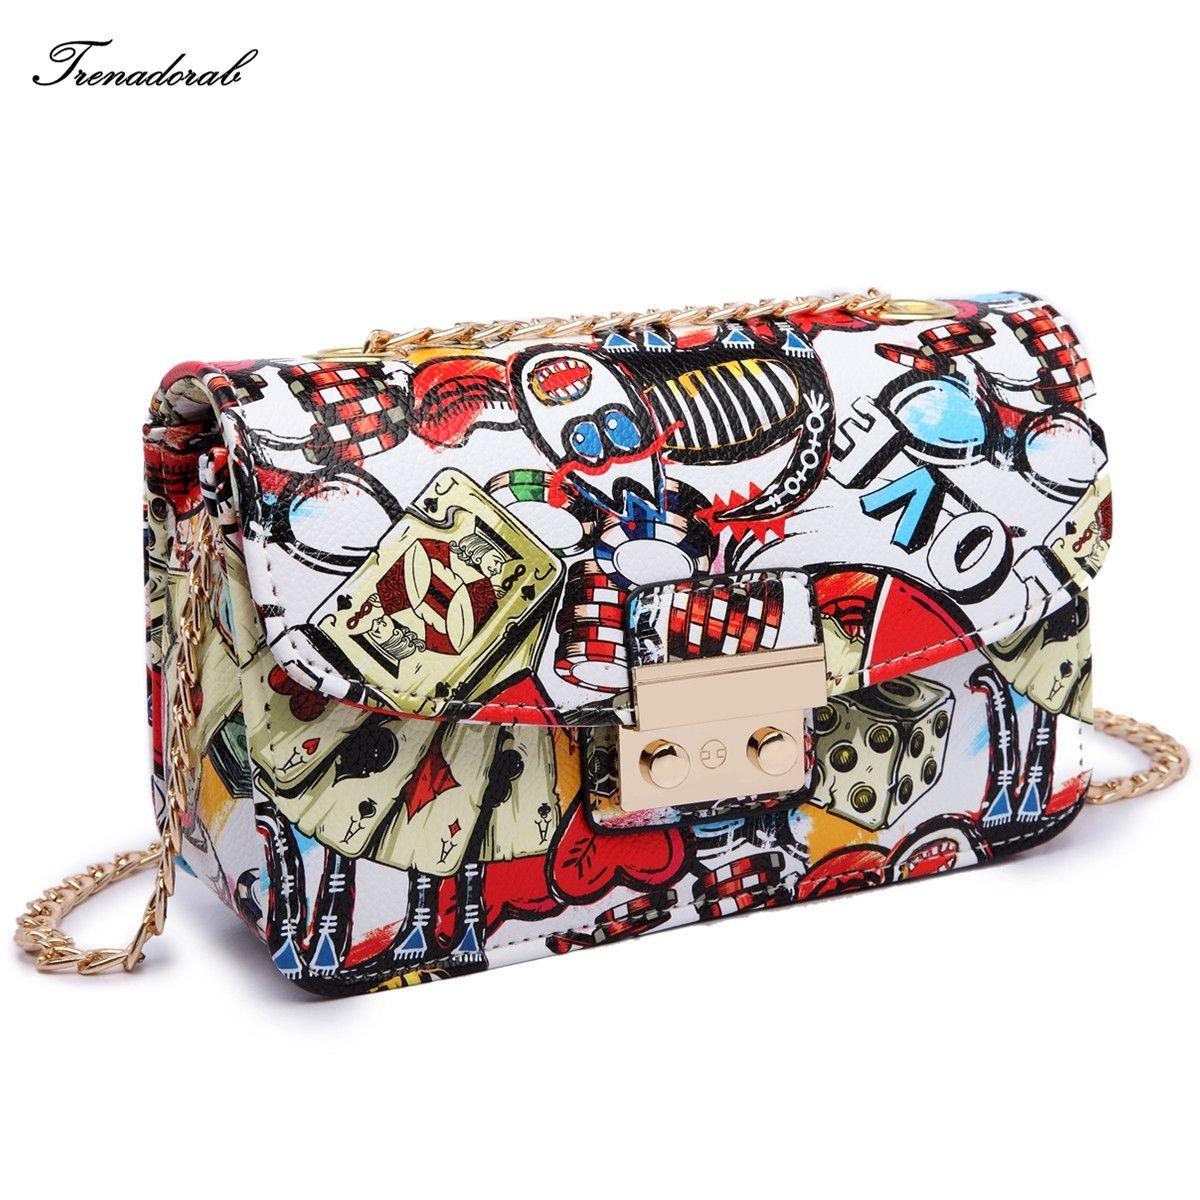 2bdb9bc796 Trenadorab Brand Print Crossbody Bags Ladies Chain Beach Bags Love Graffiti  Messenger Bags For Lady Clutch Designer Handbags SAC.